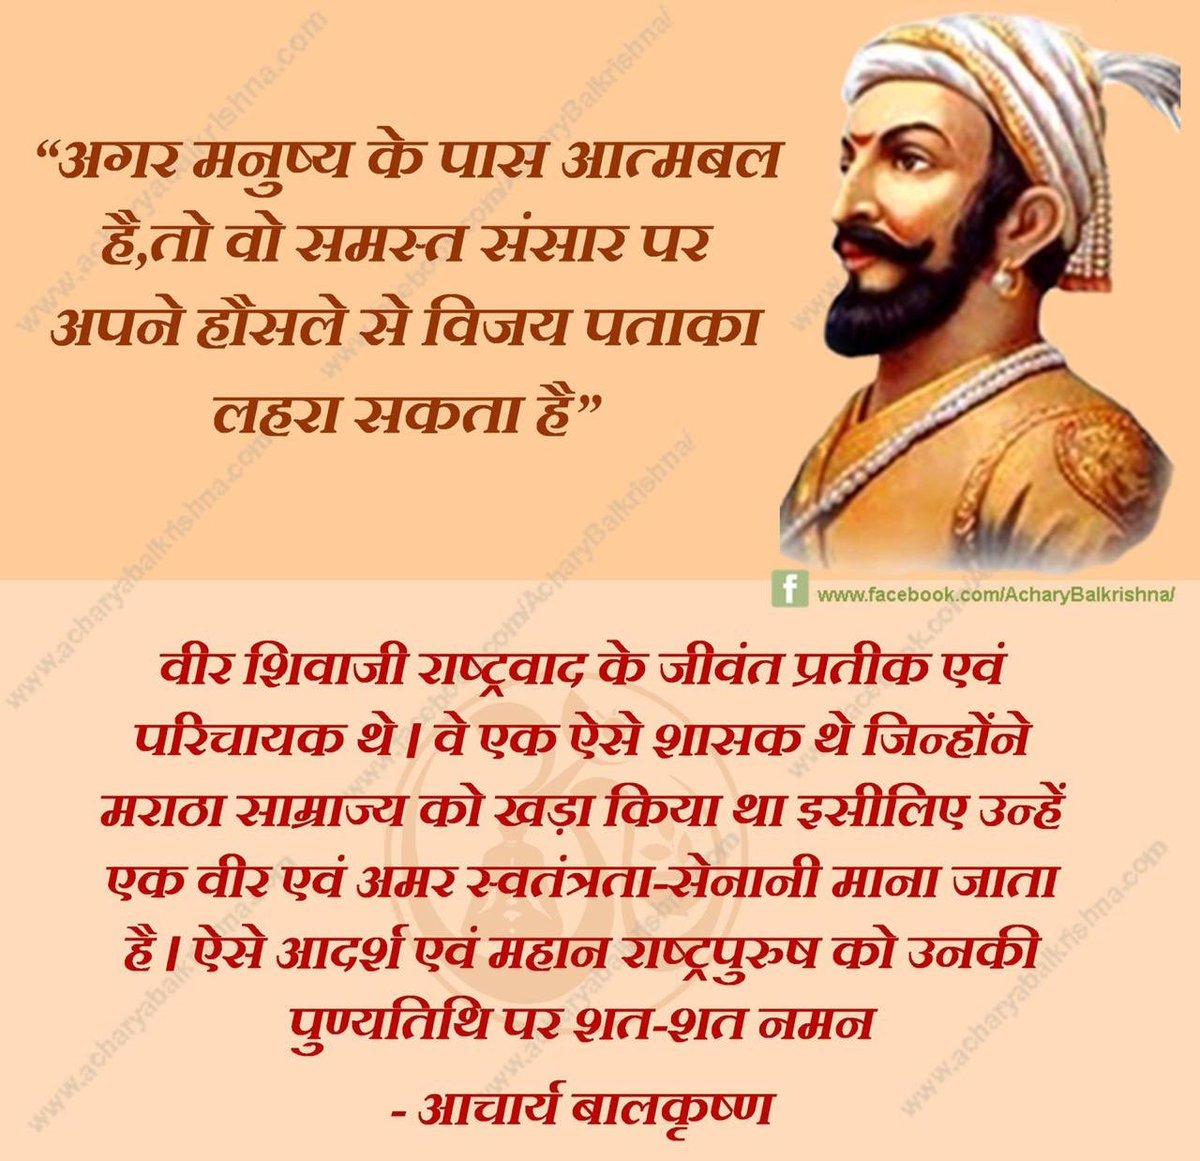 #RT @Ach_Balkrishna: महान #राष्ट्रपुरुष श्री #शिवाजी महाराज को उनकी पुण्यतिथि पर शत-शत नमन  #आचार्यबालकृष्ण #acharyabalkrishna   #Patanjali #ShivajiMaharaj pic.twitter.com/gduDwExv9W